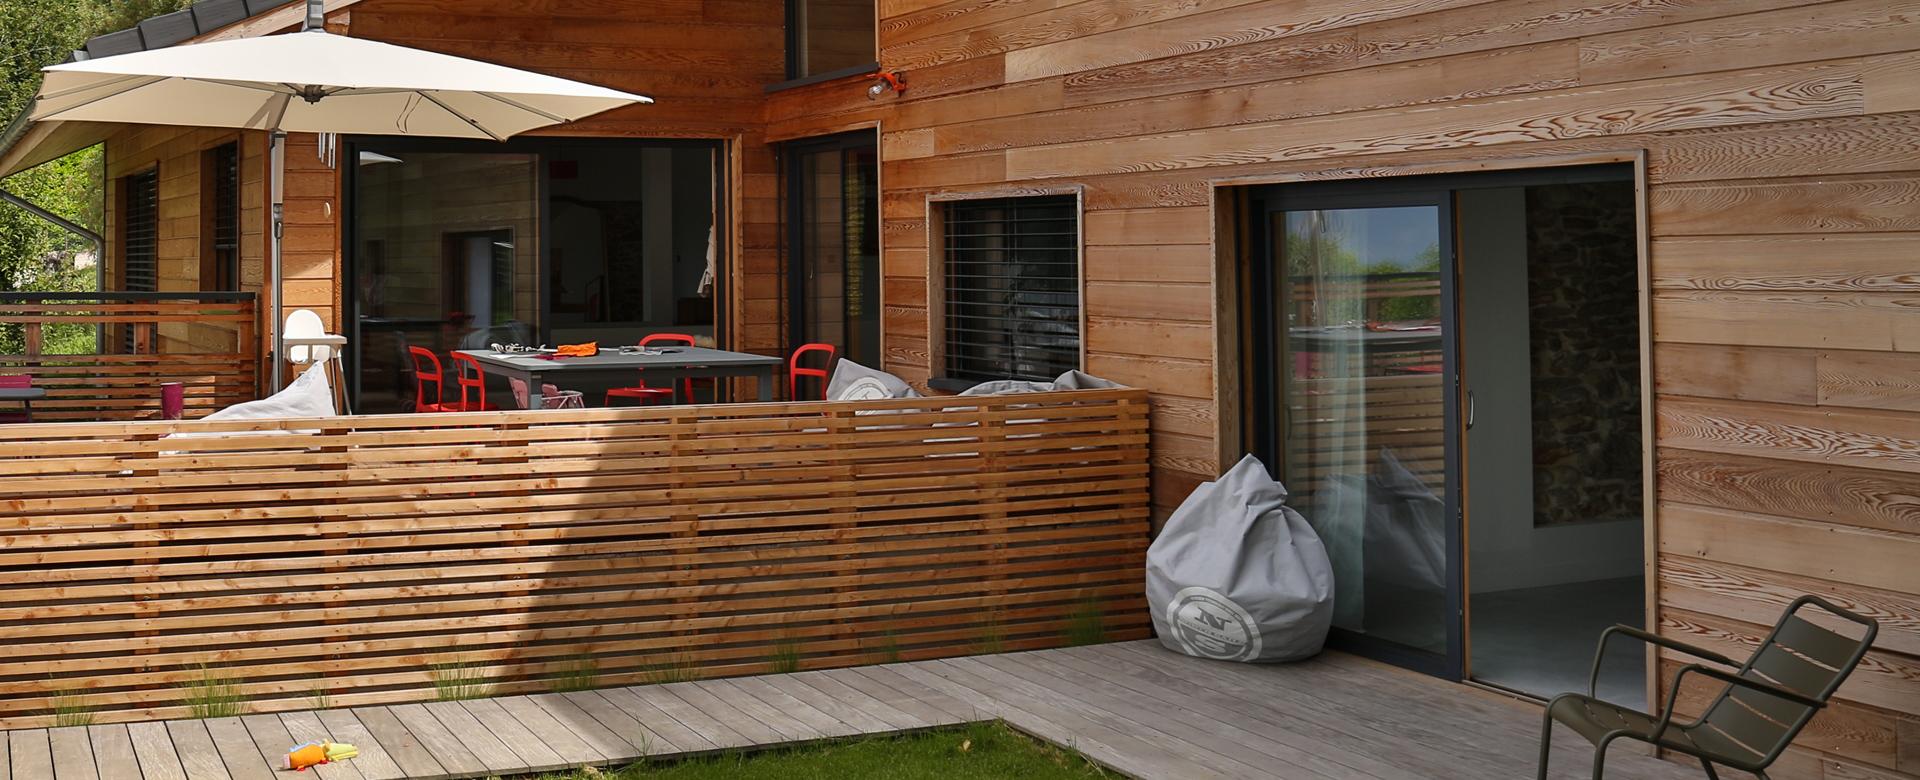 domki i tarasy drewniane